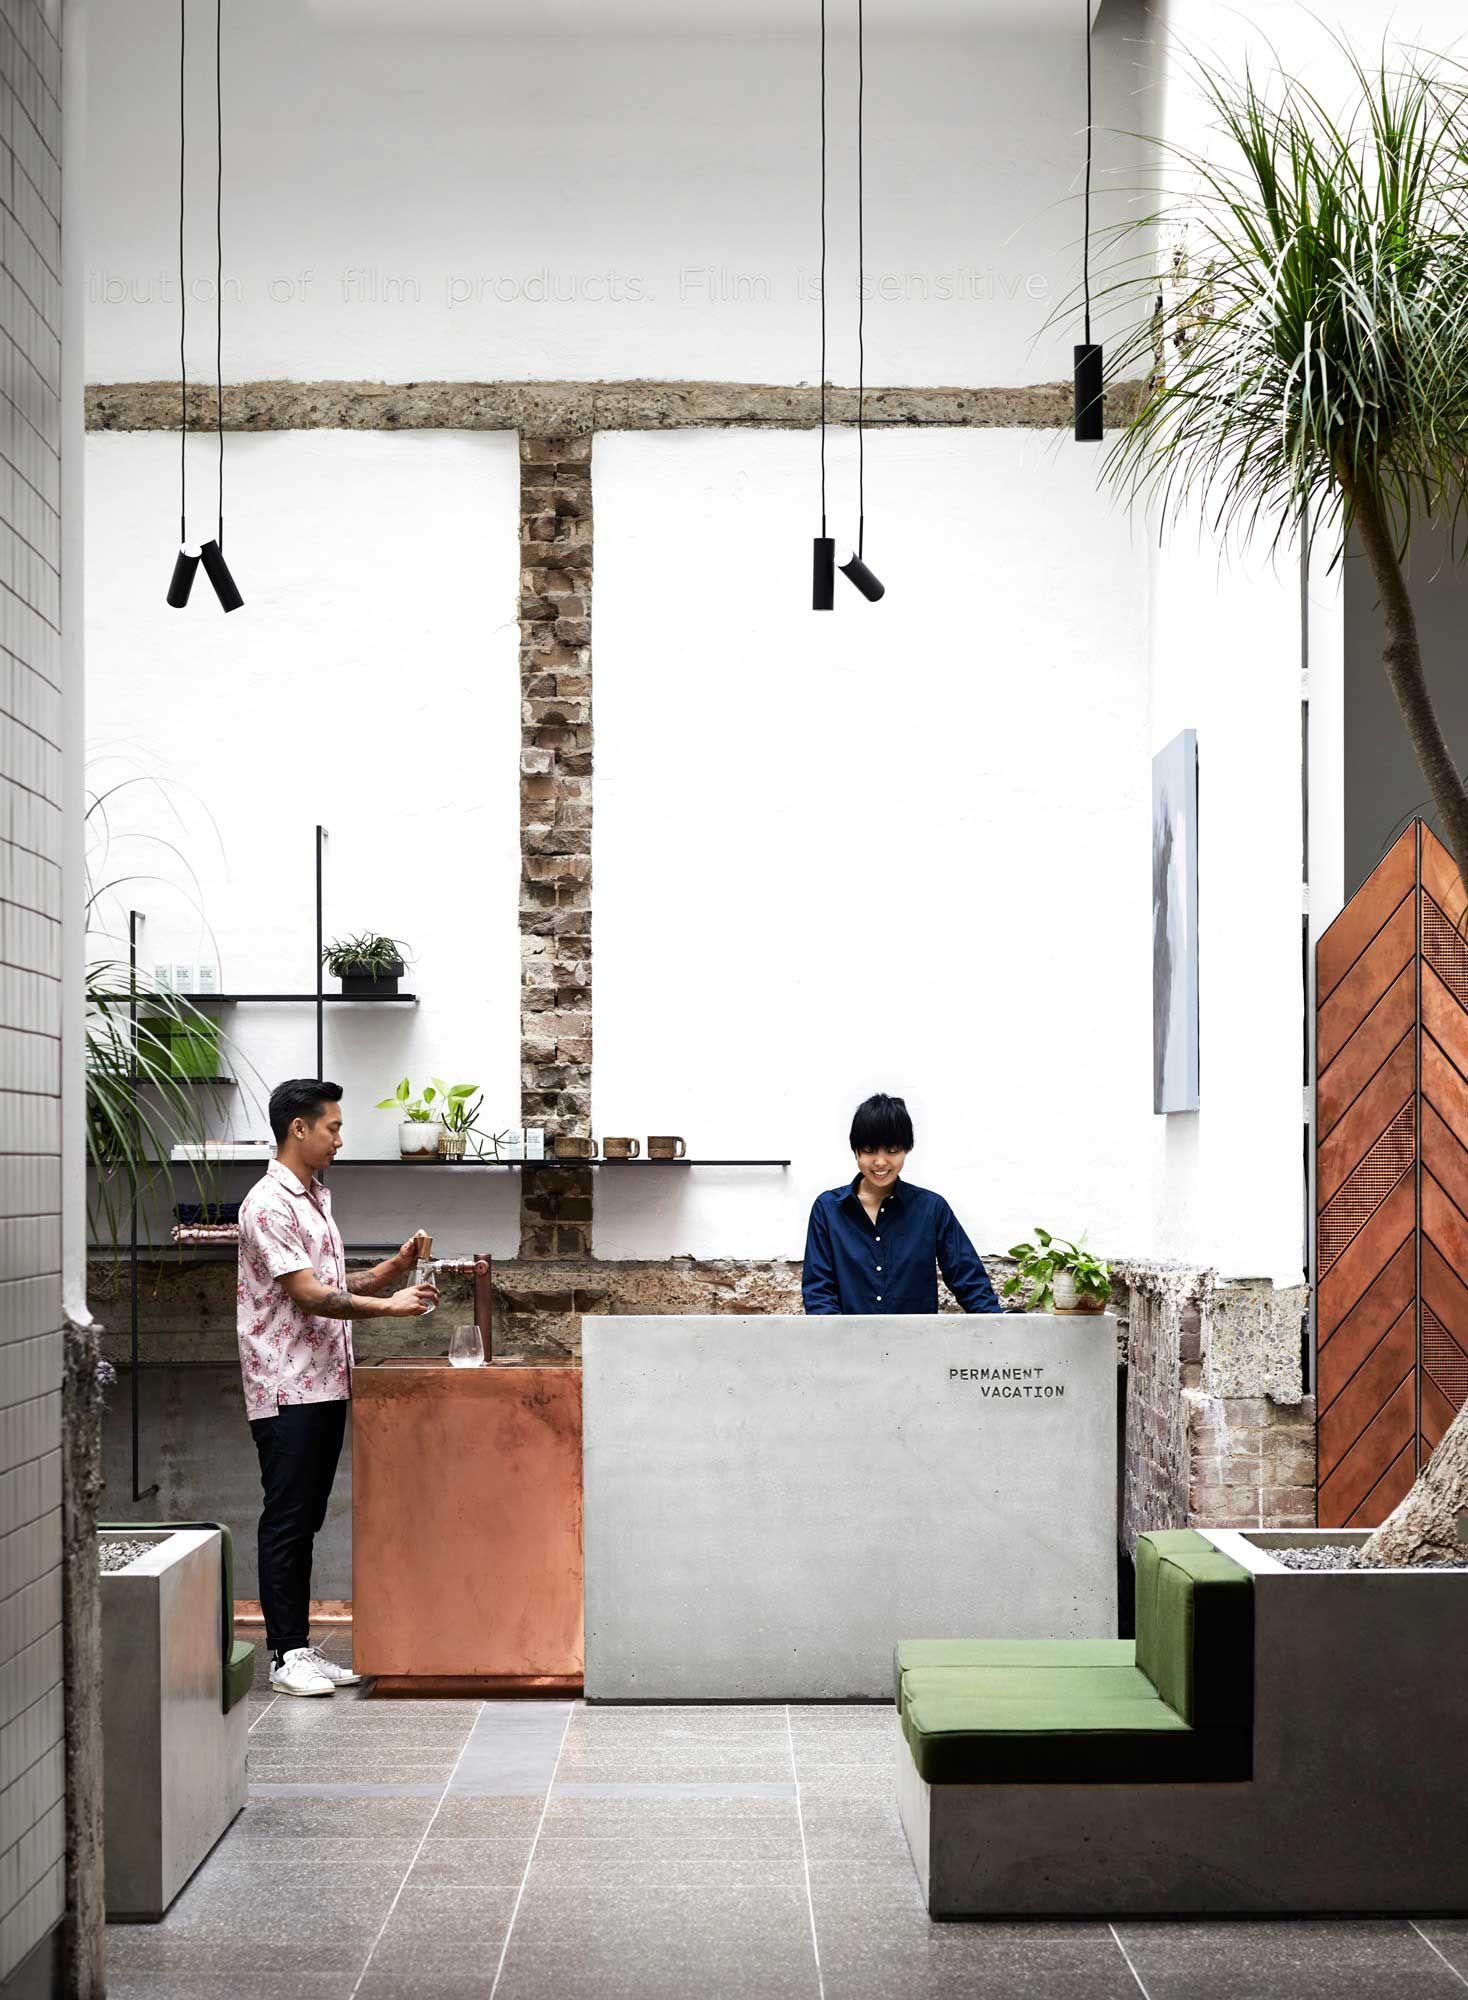 Sydney S Best Inner City Boutique Hotels Boutique Hotels Design Hotel Decor Hotel Interior Design